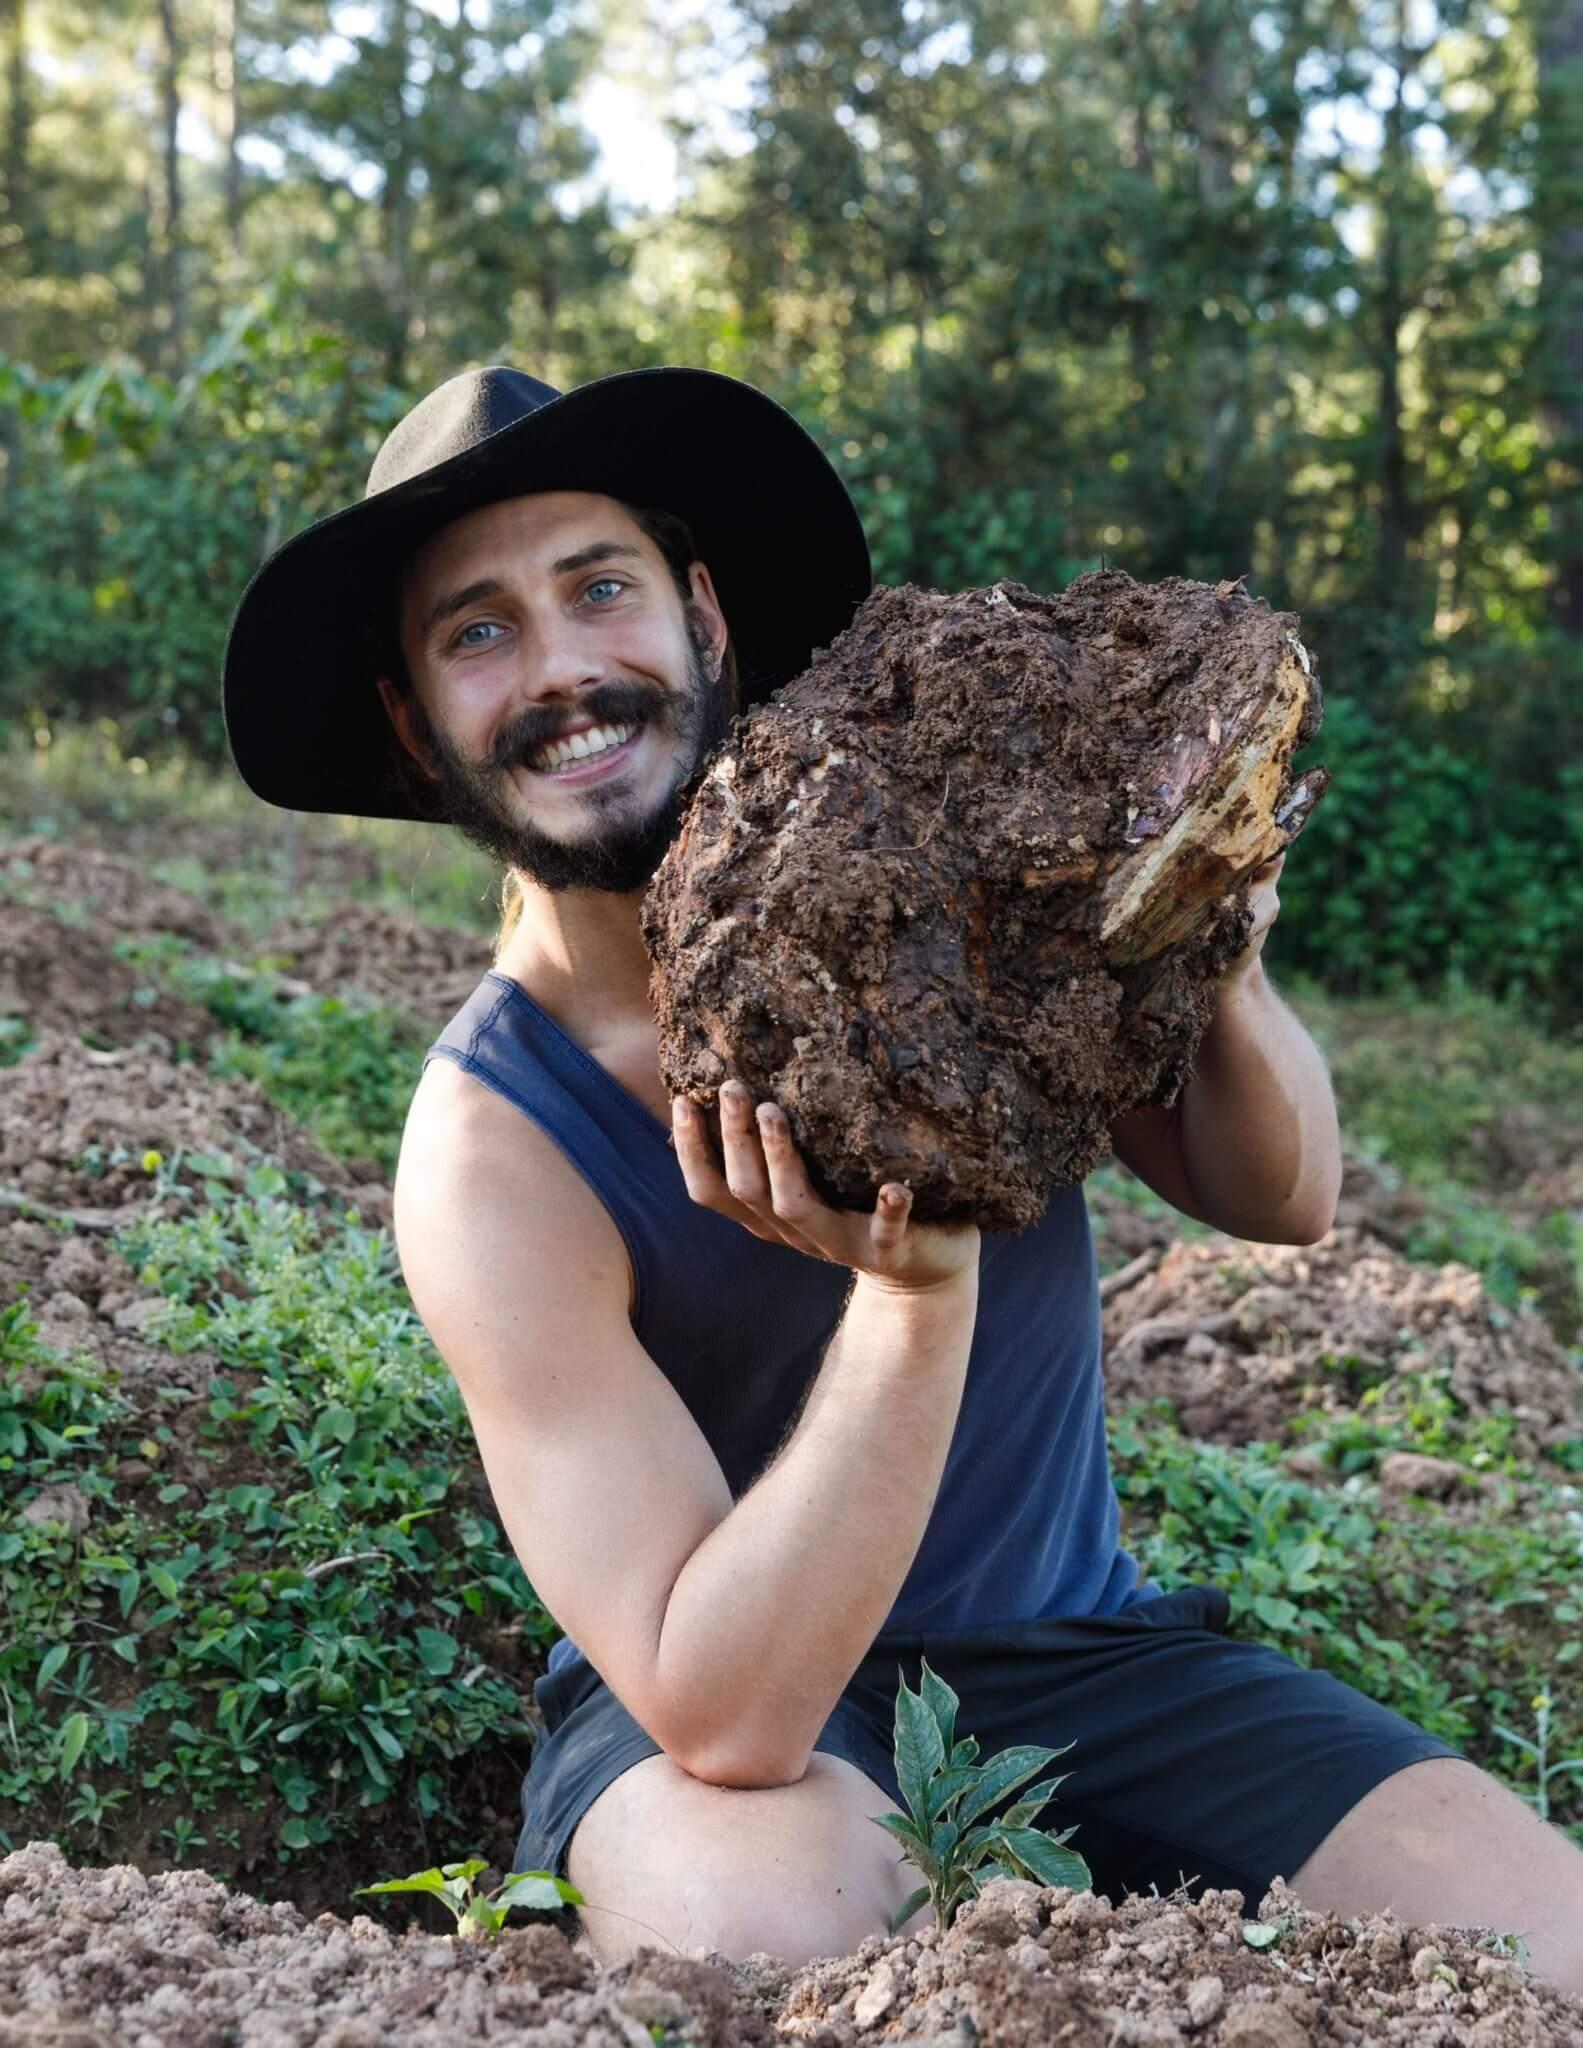 Mason Taylor harvesting Chaga Mushrooms in a forrest